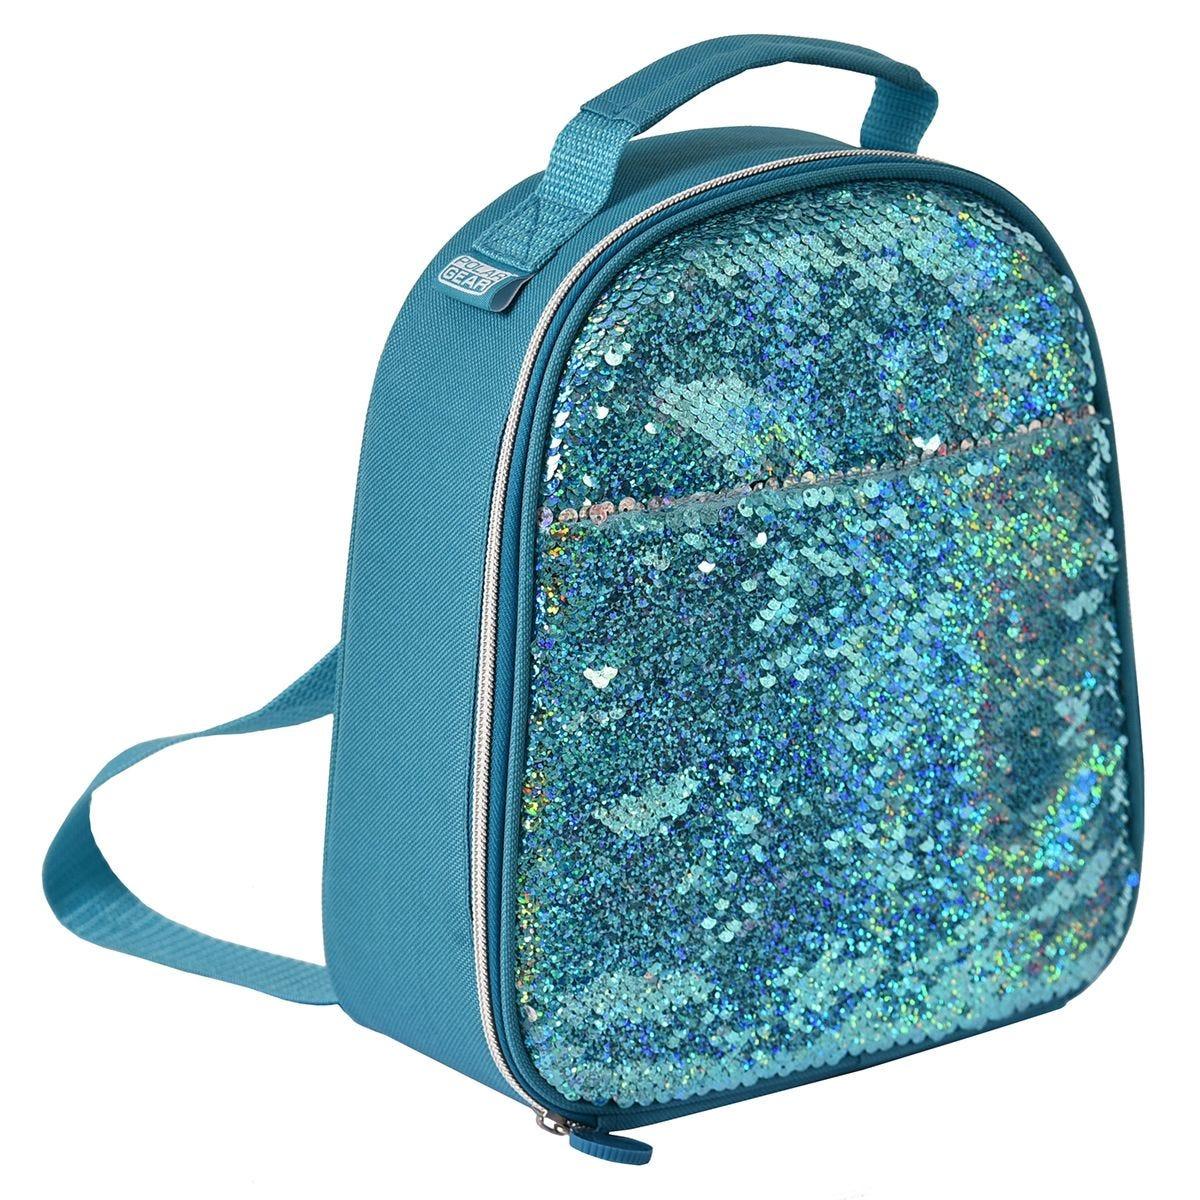 Polar Gear Mermaid Sequin Backpack Cooler Bag